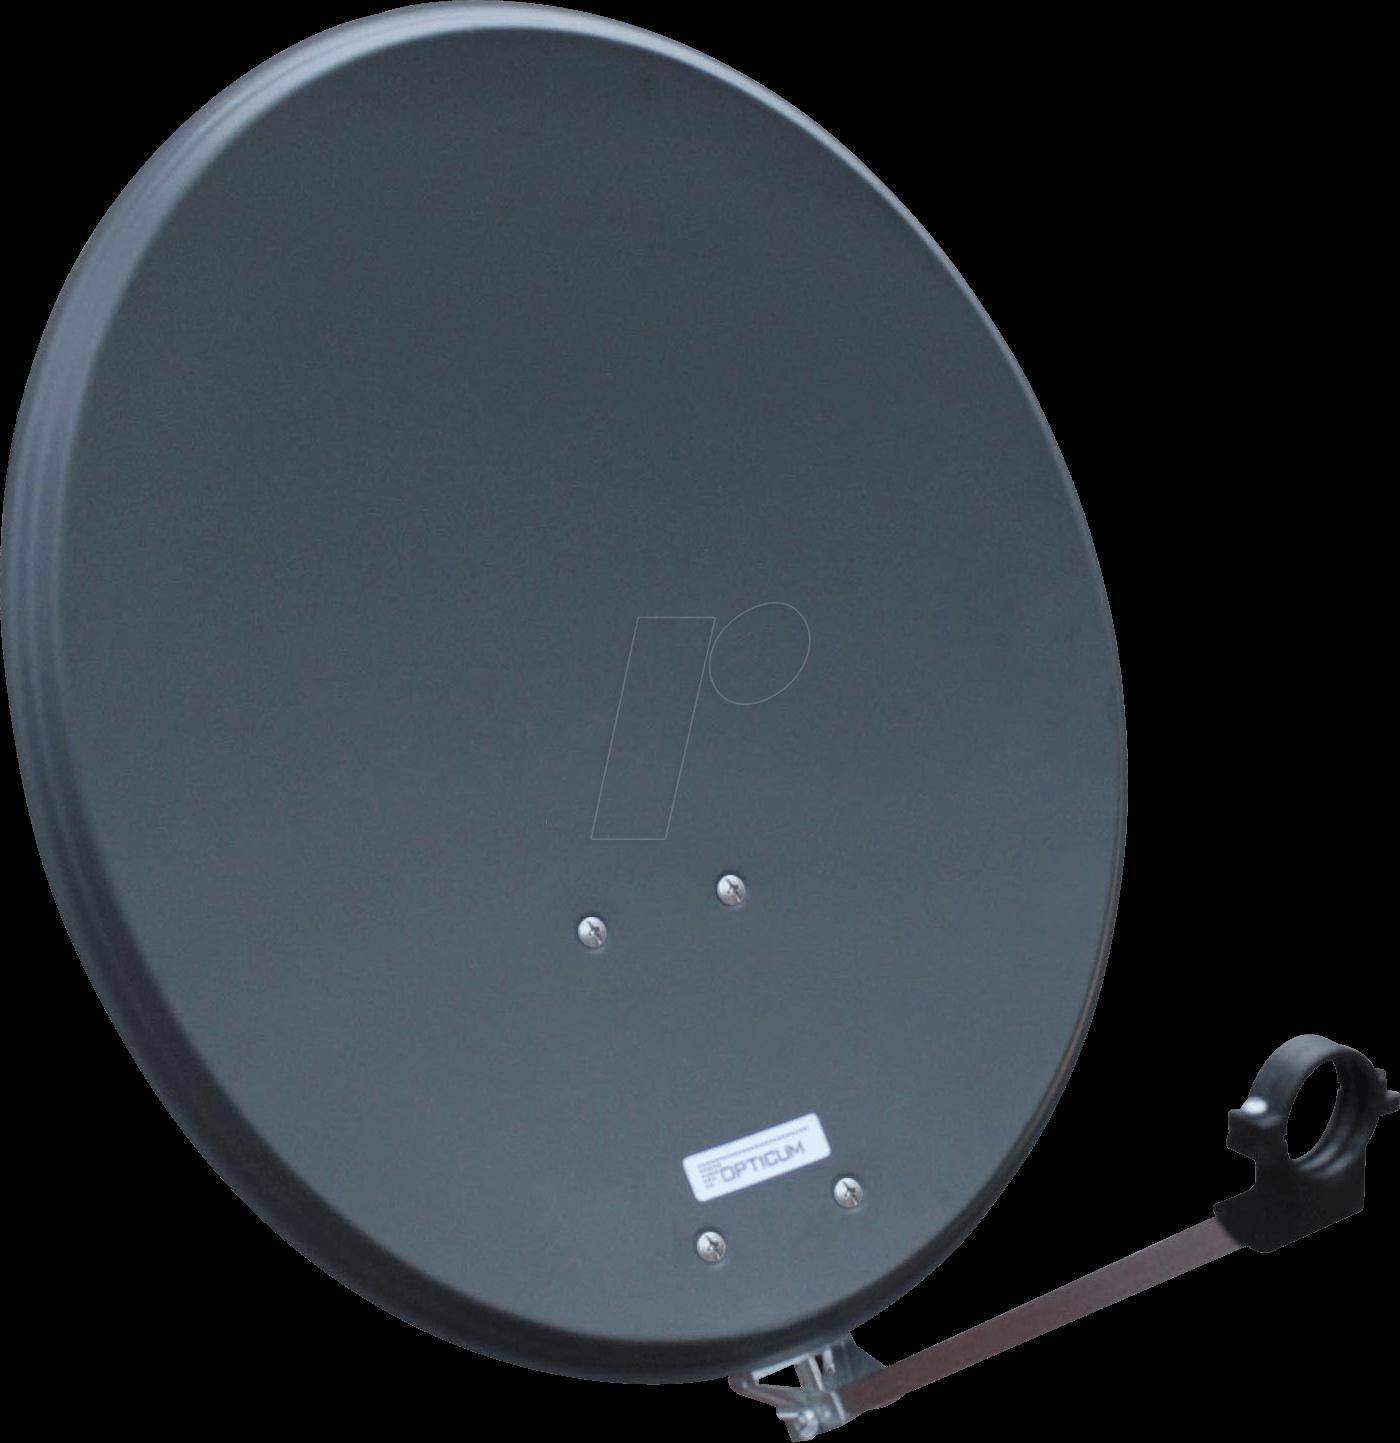 OPTICUM 9128 - Sat Antenne Stahl, Anthrazit, Single LNB